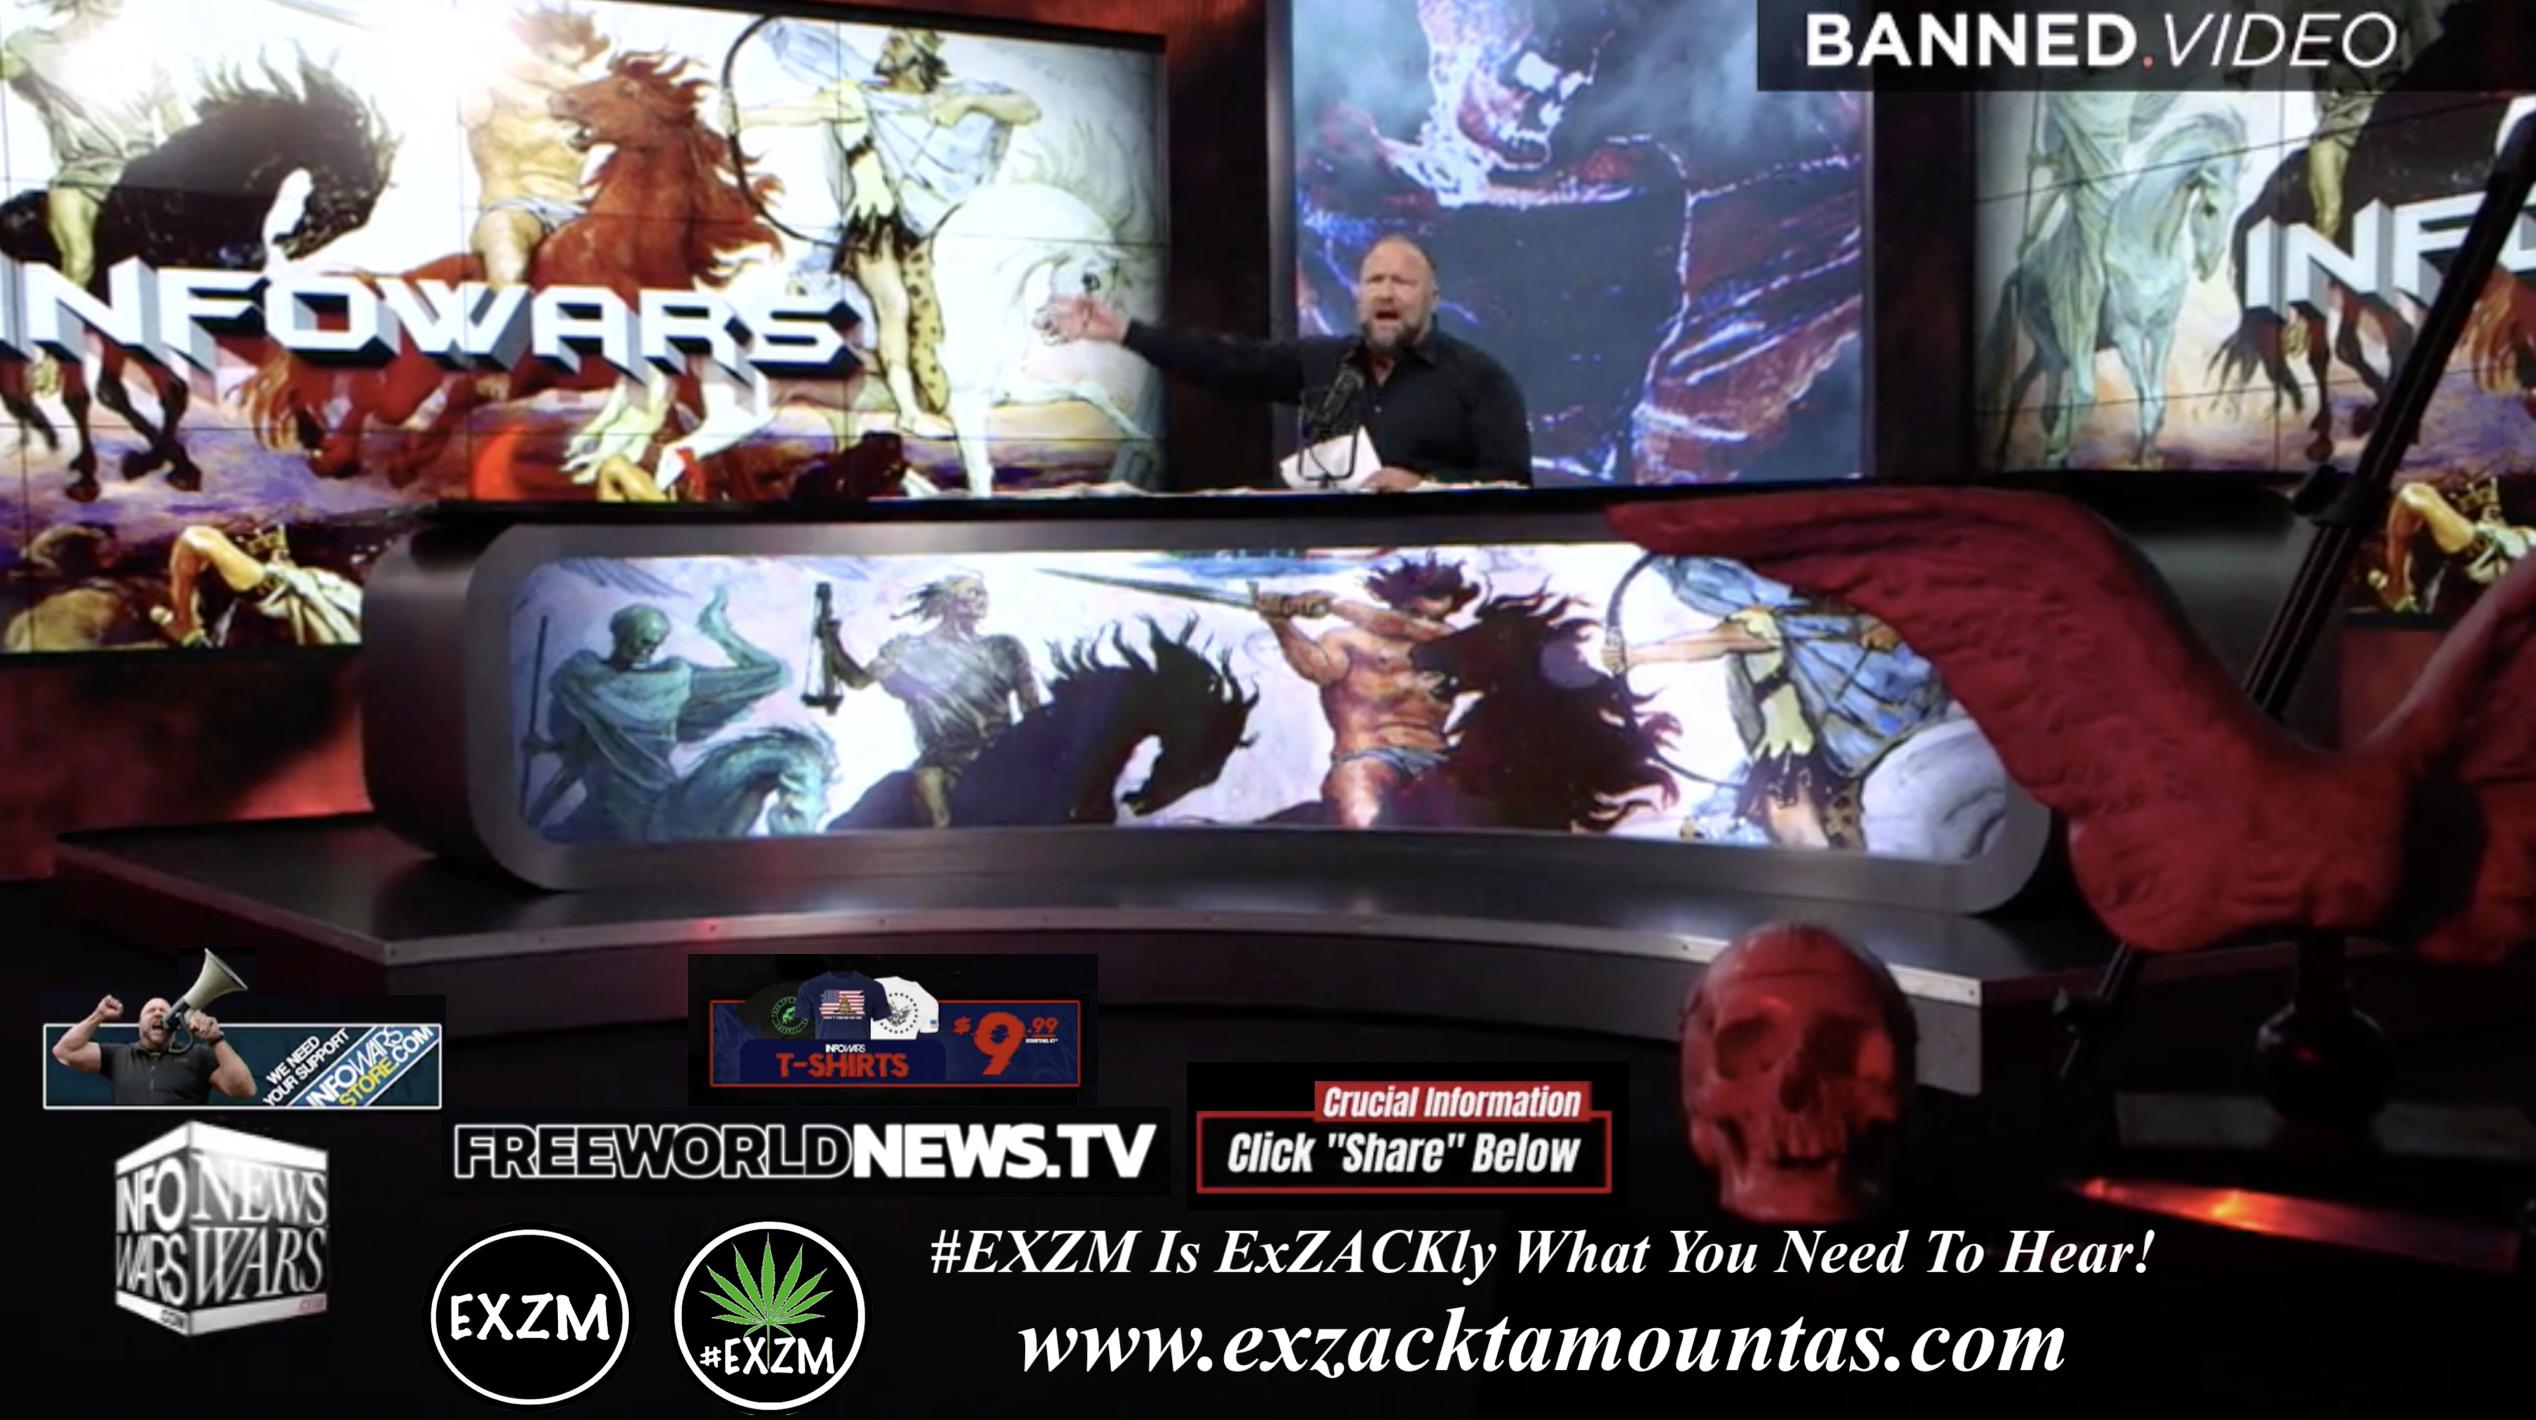 Alex Jones Live In Infowars Studio Free World News TV Human Skull Dagger Angel Wings EXZM Zack Mount September 24th 2021 copy